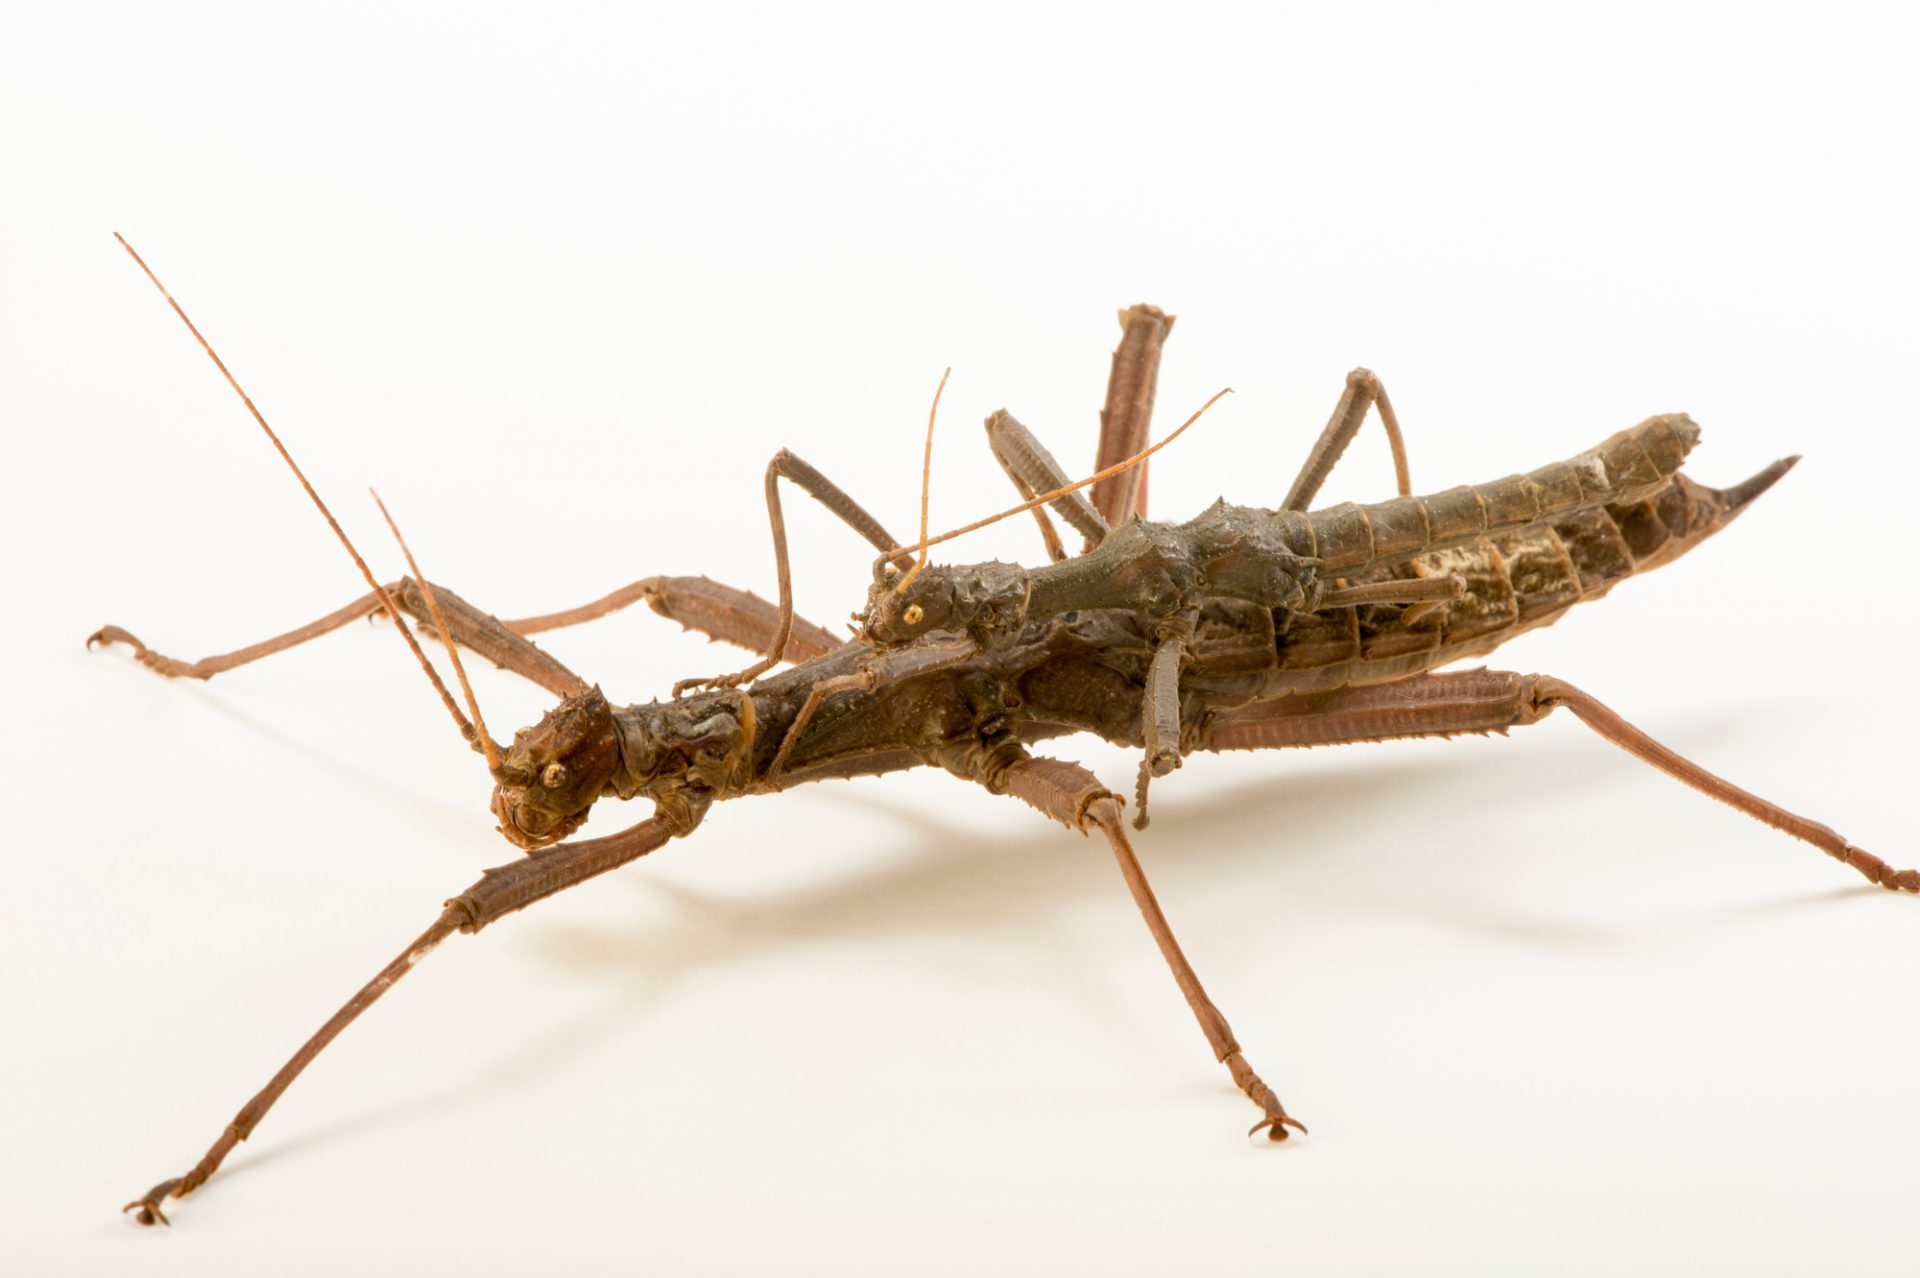 Photo: Giant thorn cricket ( Trachyaretaon carmelae ) at the Budapest Zoo.